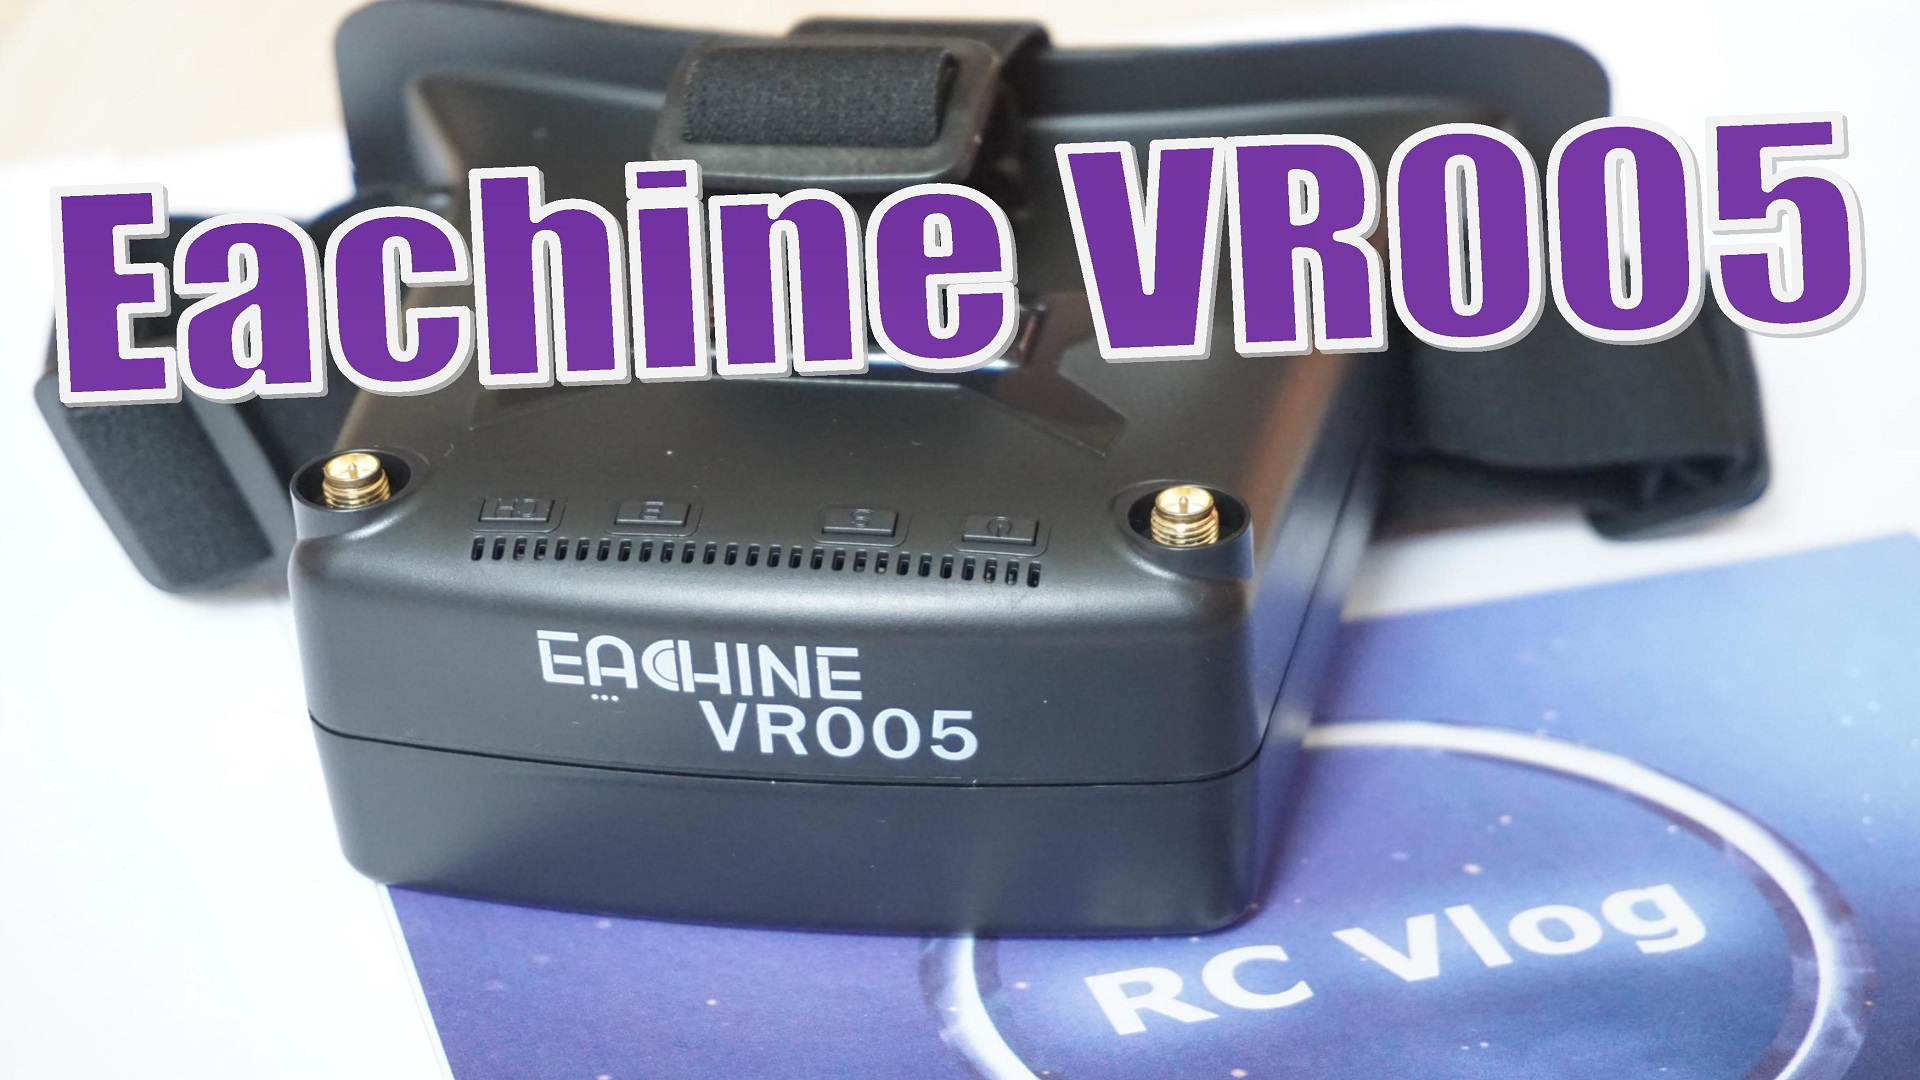 Eachine vr005